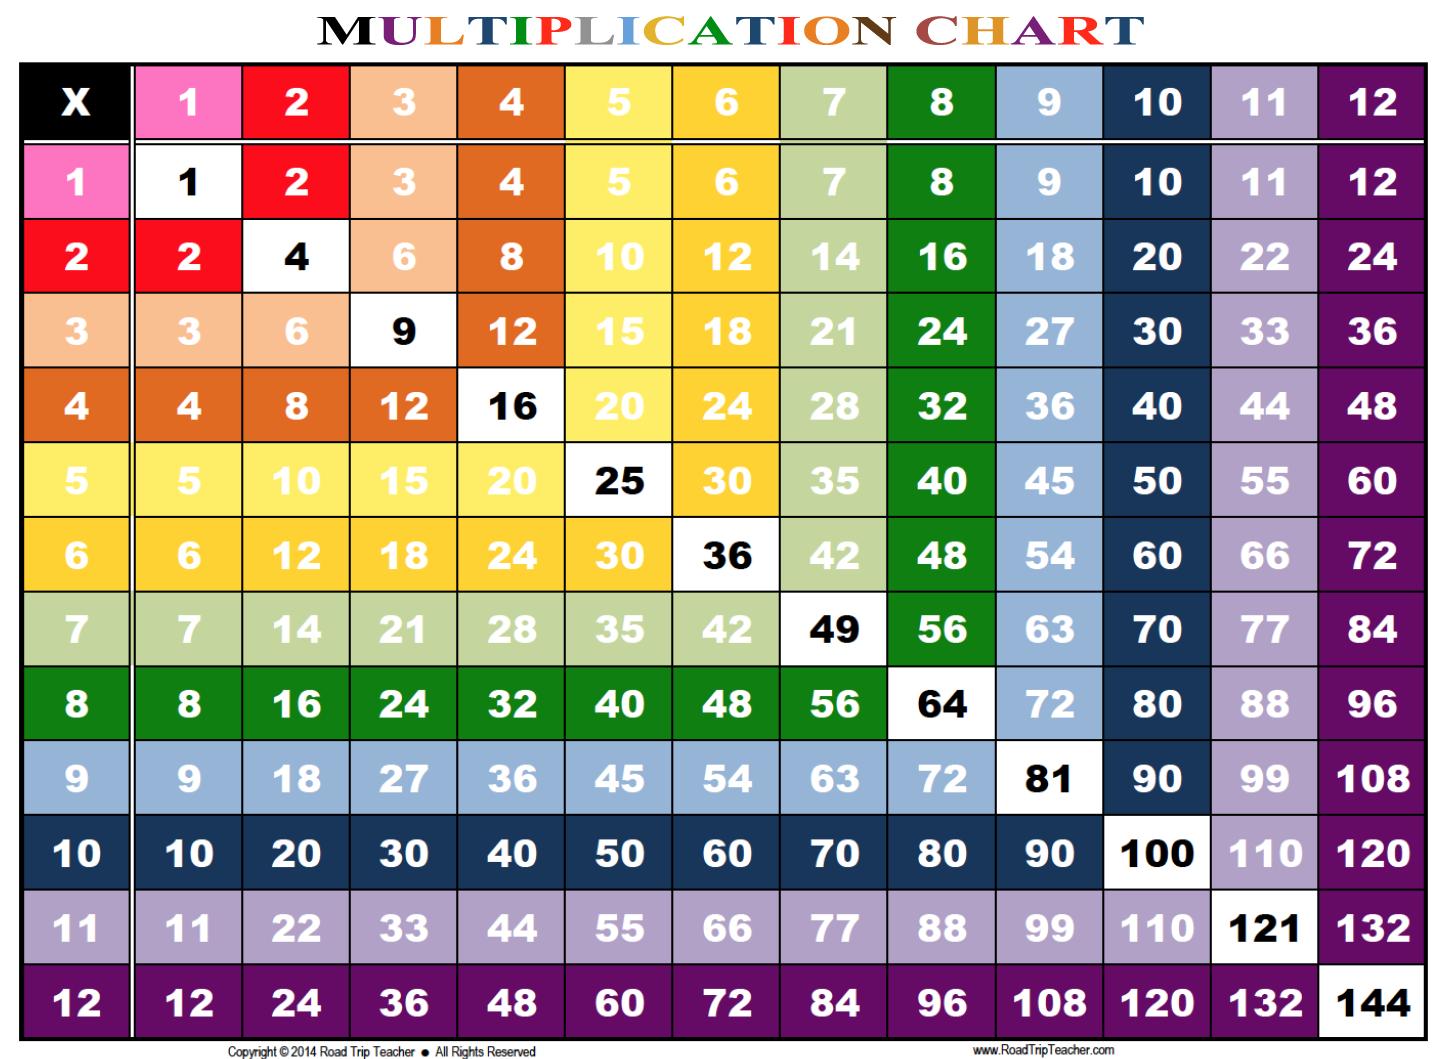 Multiplication Chart 1 12 Printable | Multiplication Chart